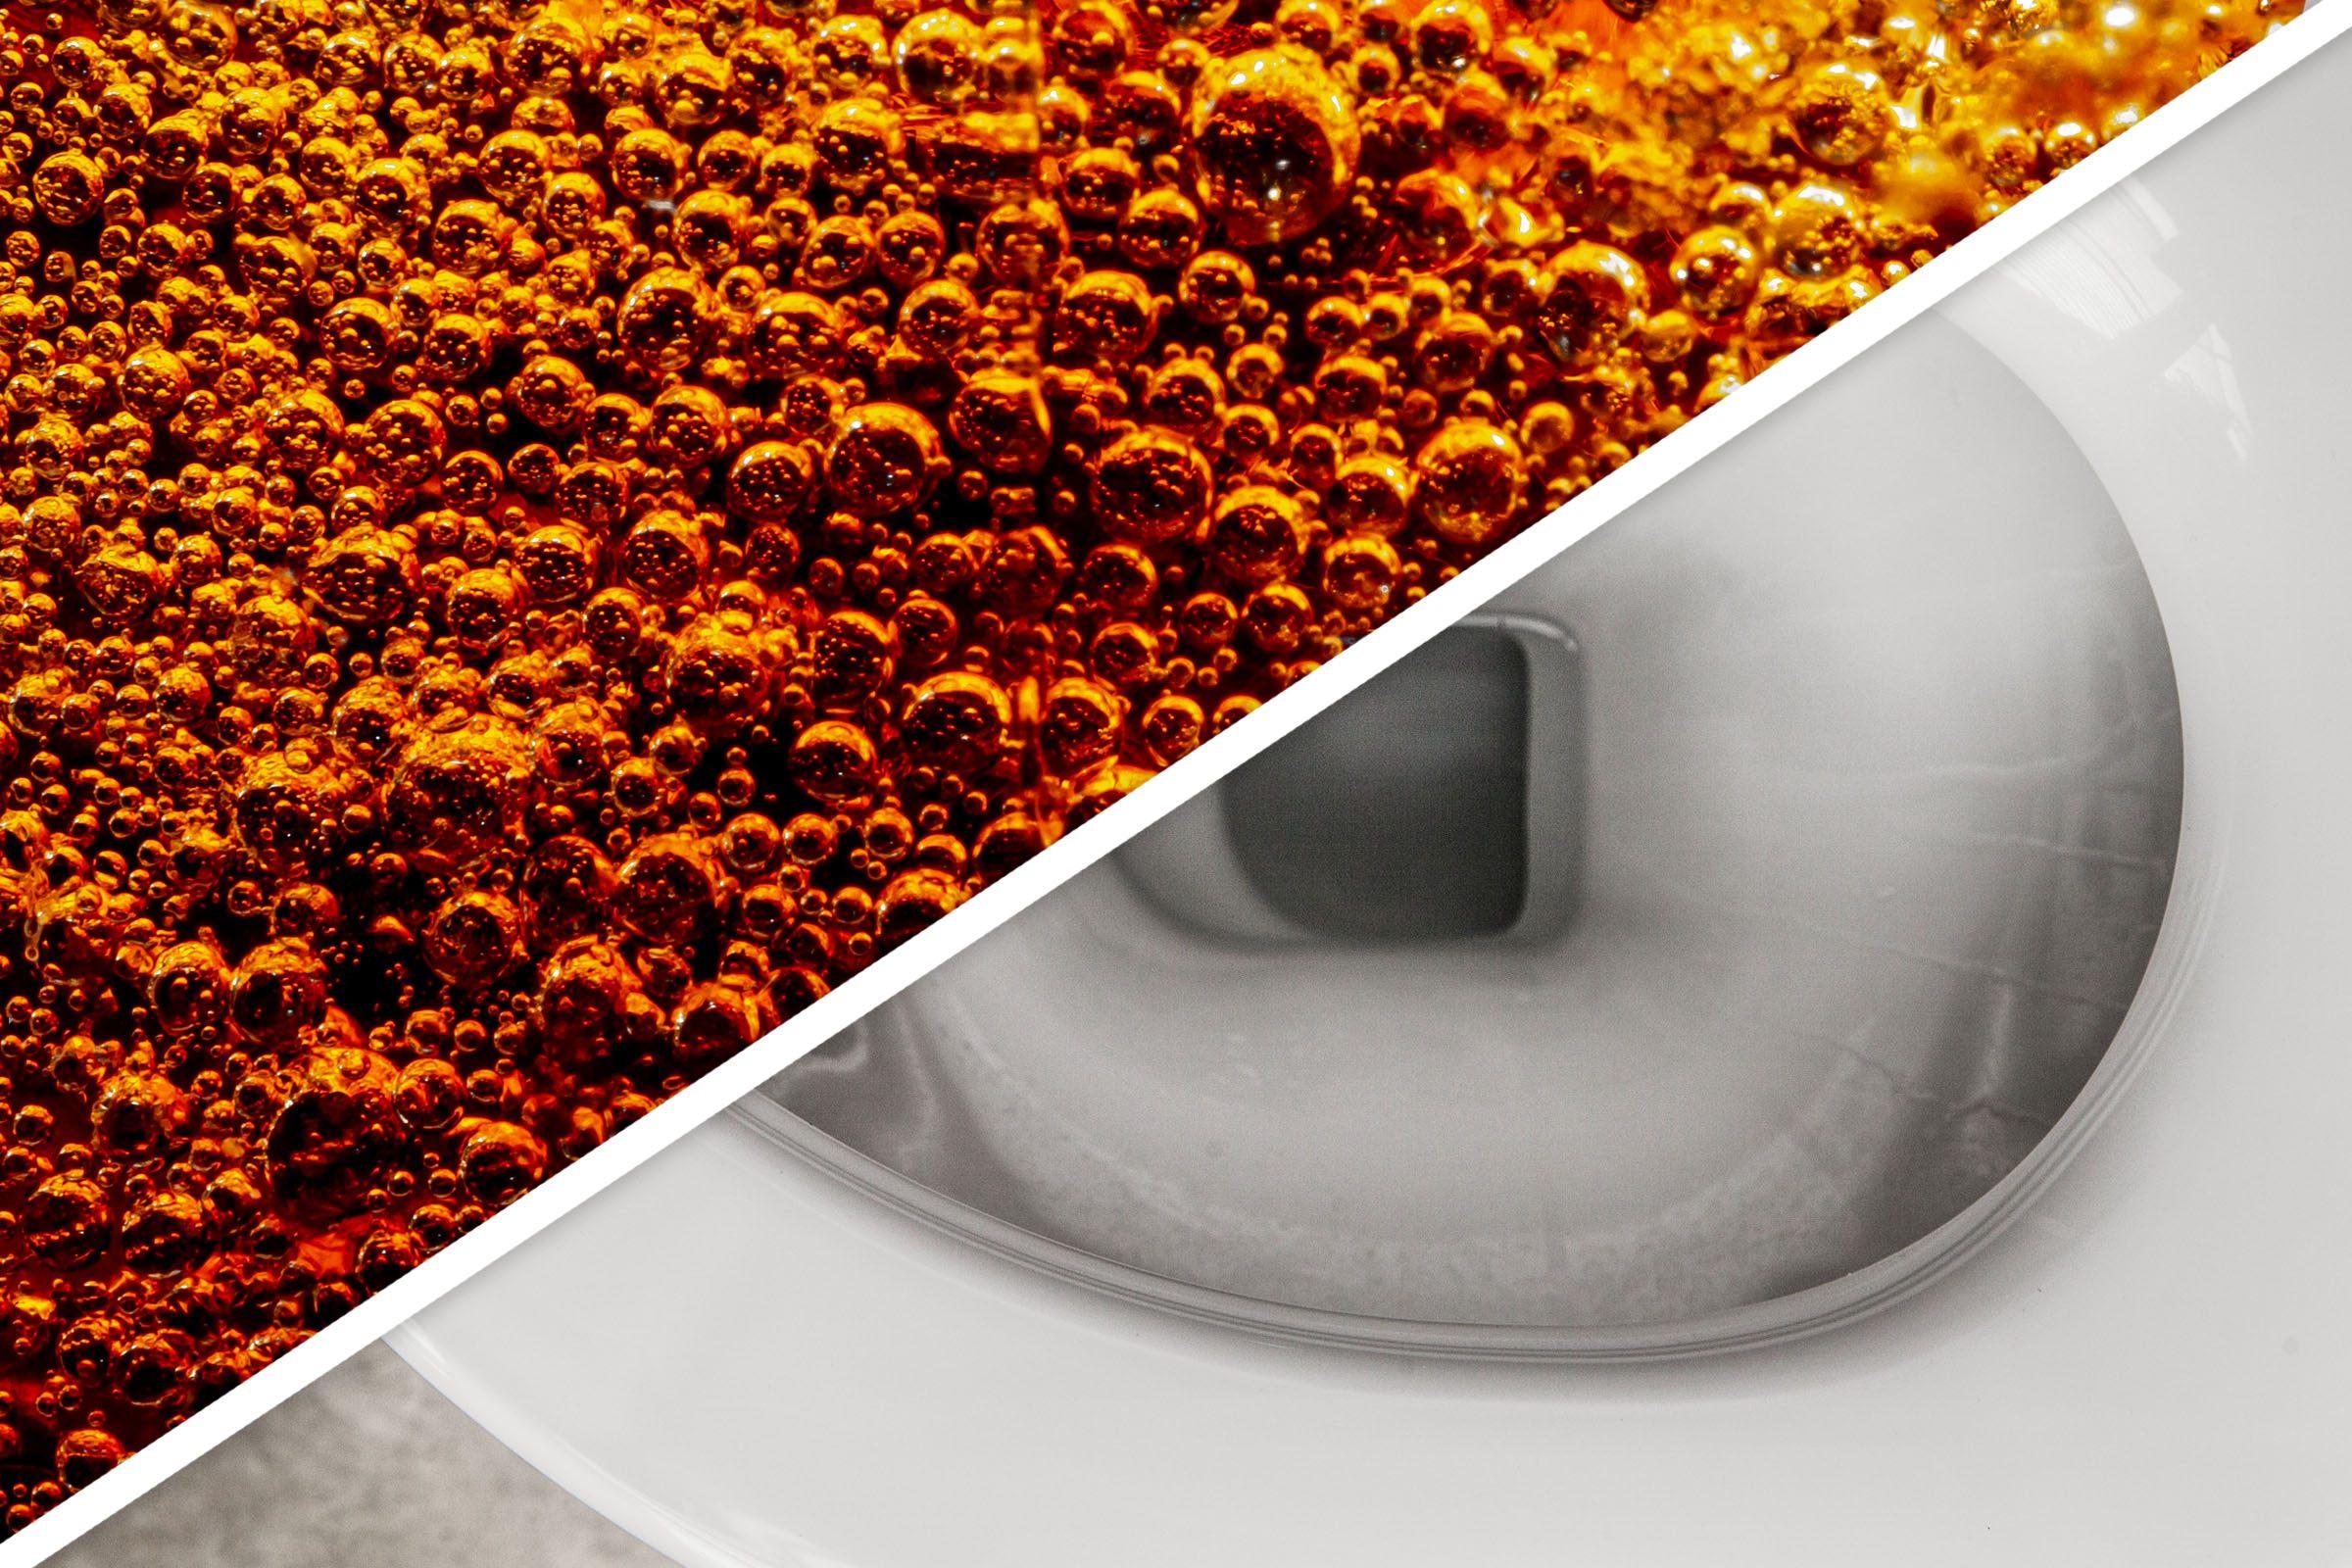 toilet soda